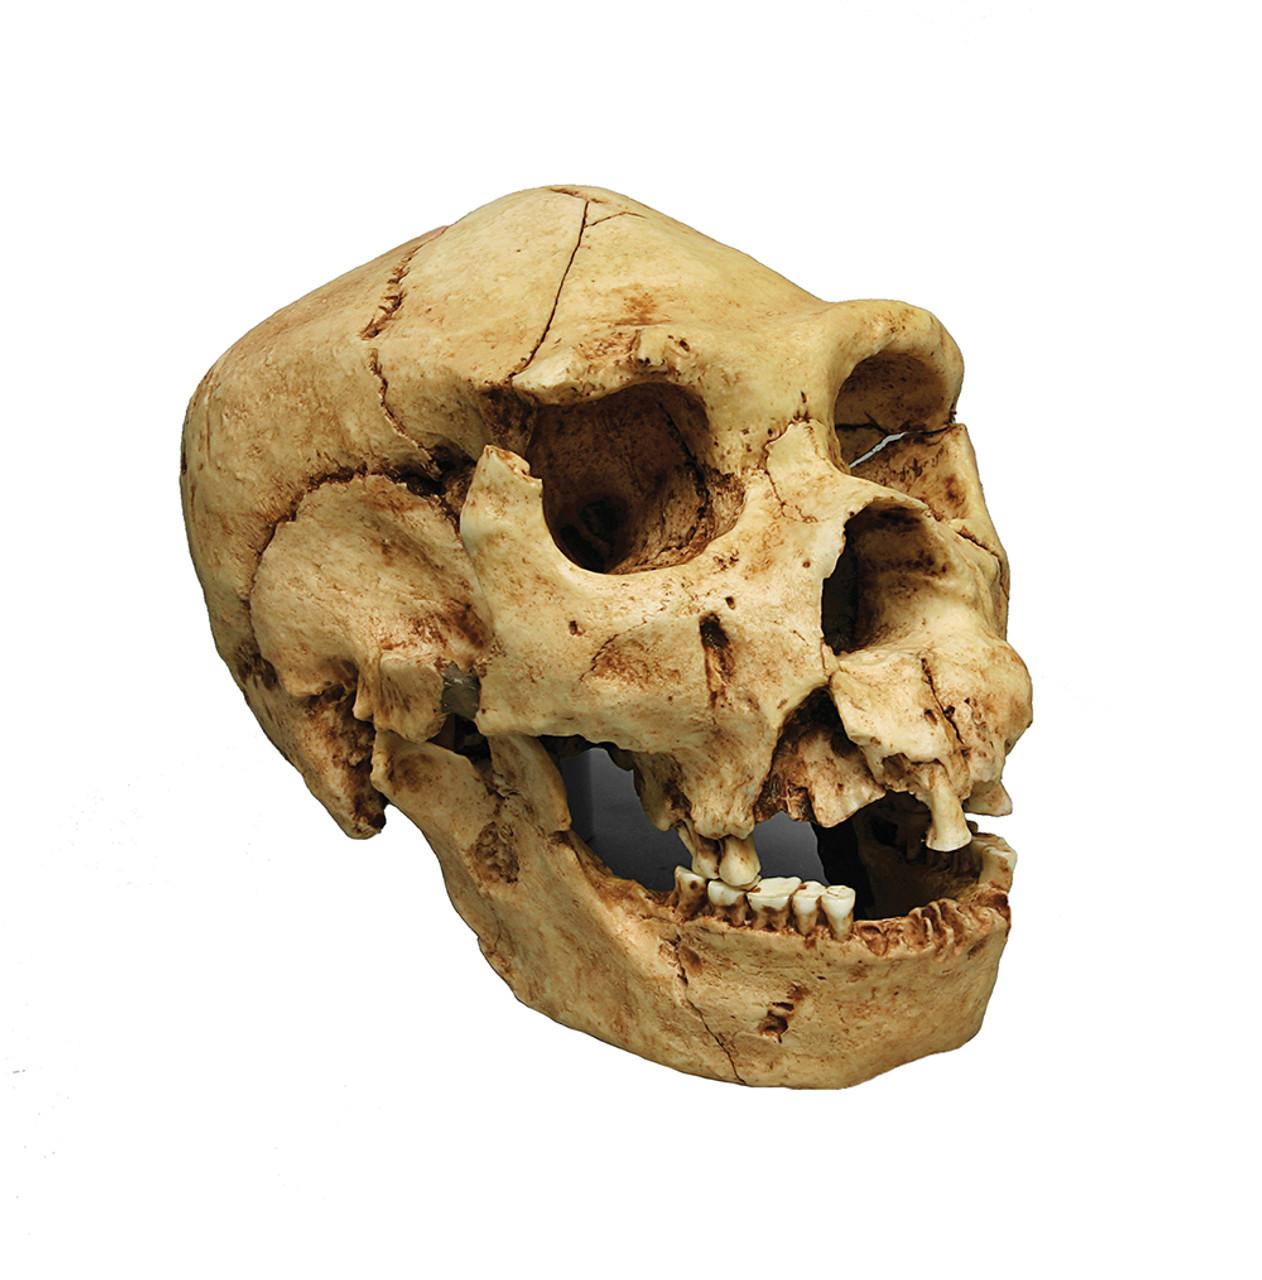 BH022 - Homo heidelbergensis, Atapuerca 5